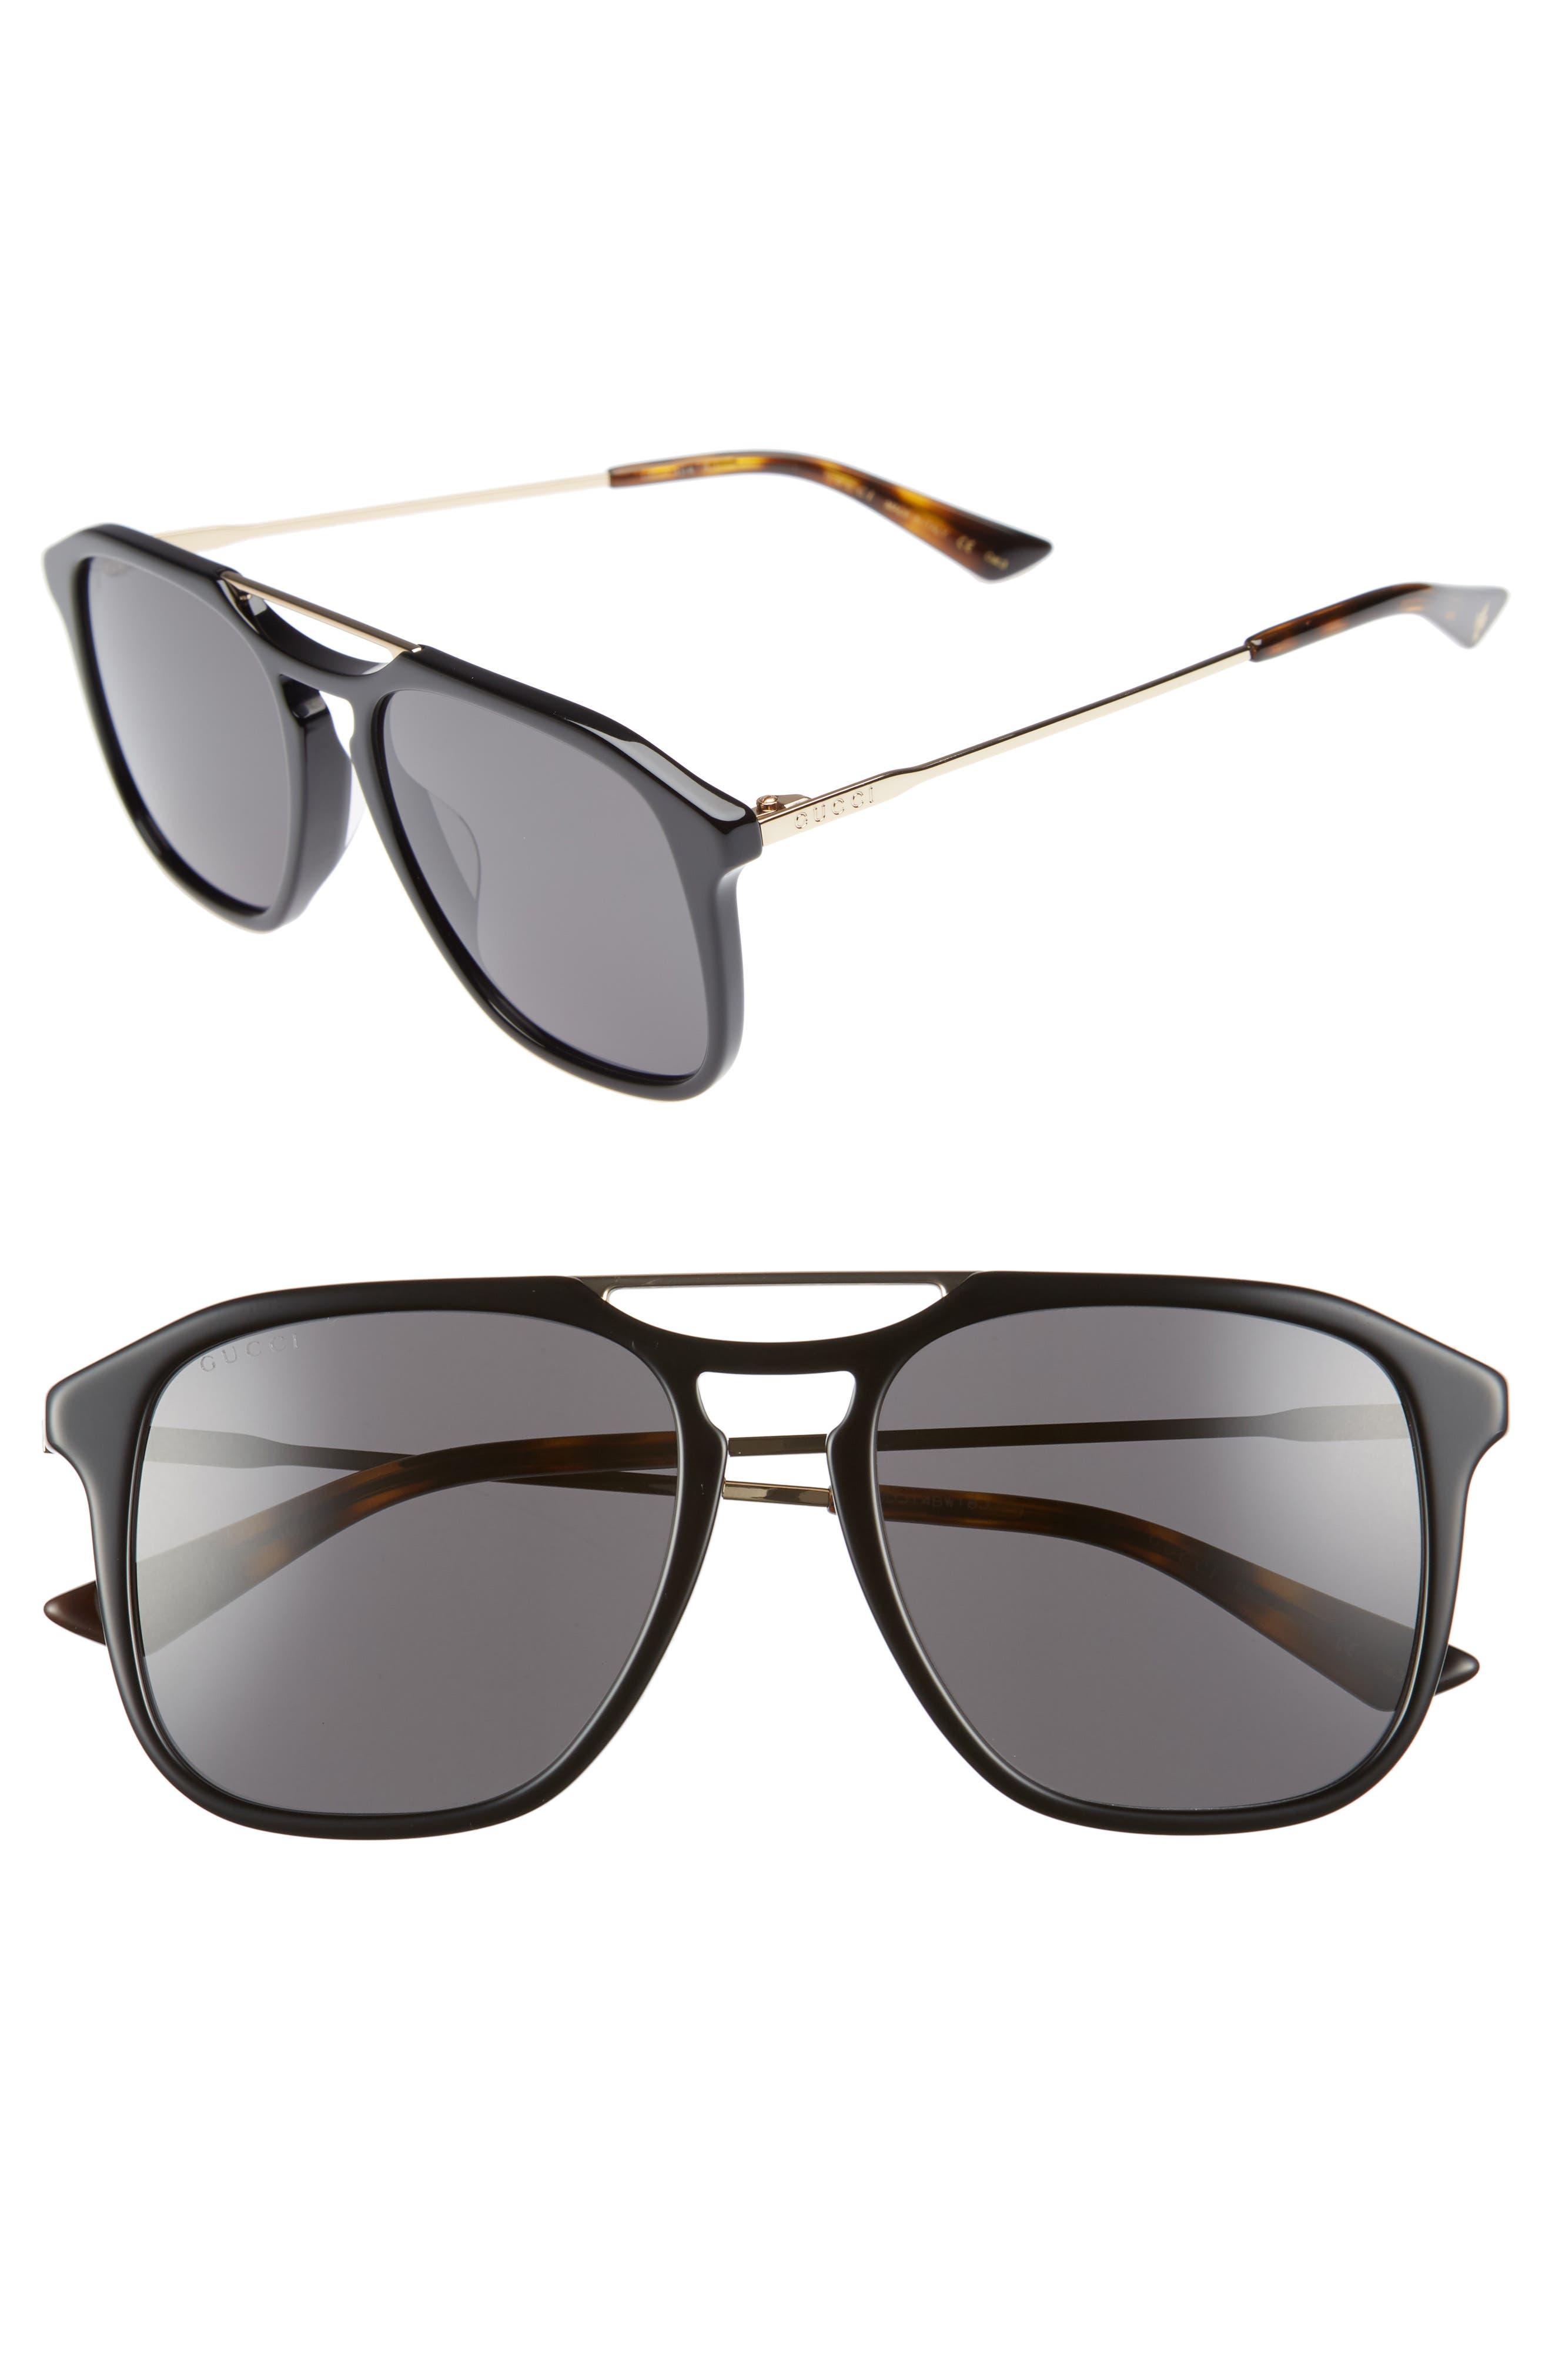 Light Combi 55mm Aviator Sunglasses,                         Main,                         color, GOLD/ DARK HAVANA